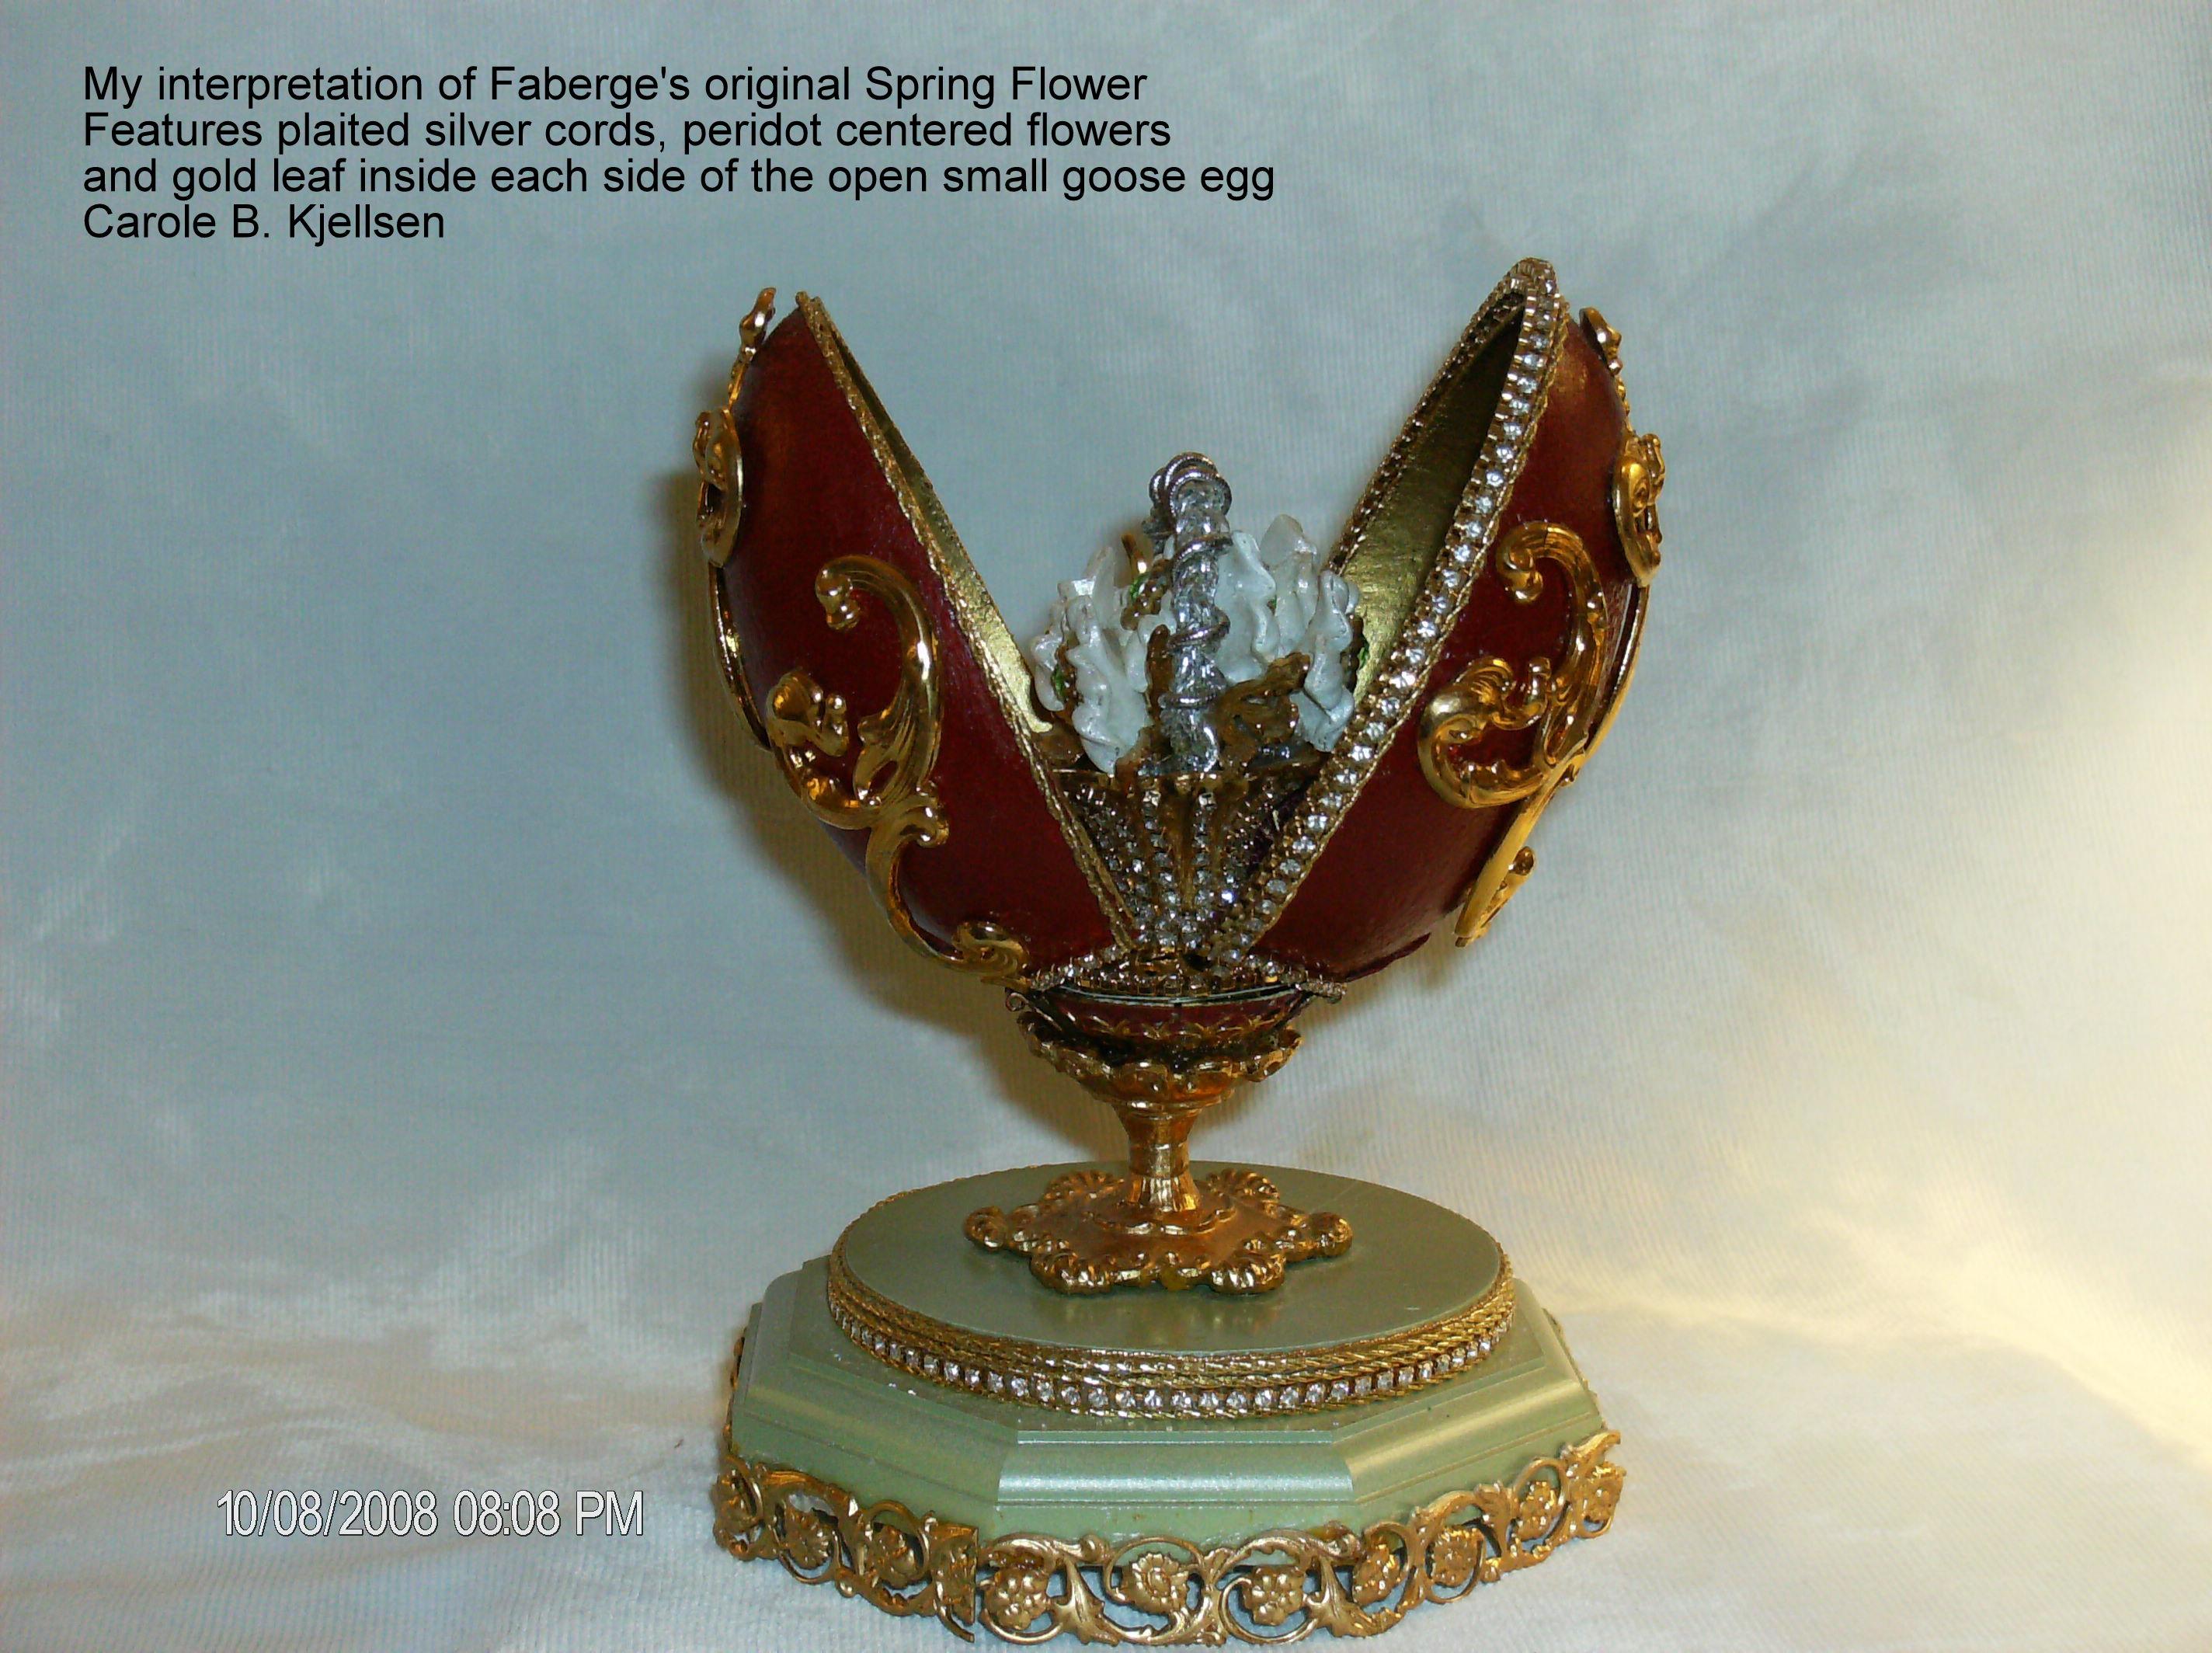 More Faberge Interpretations